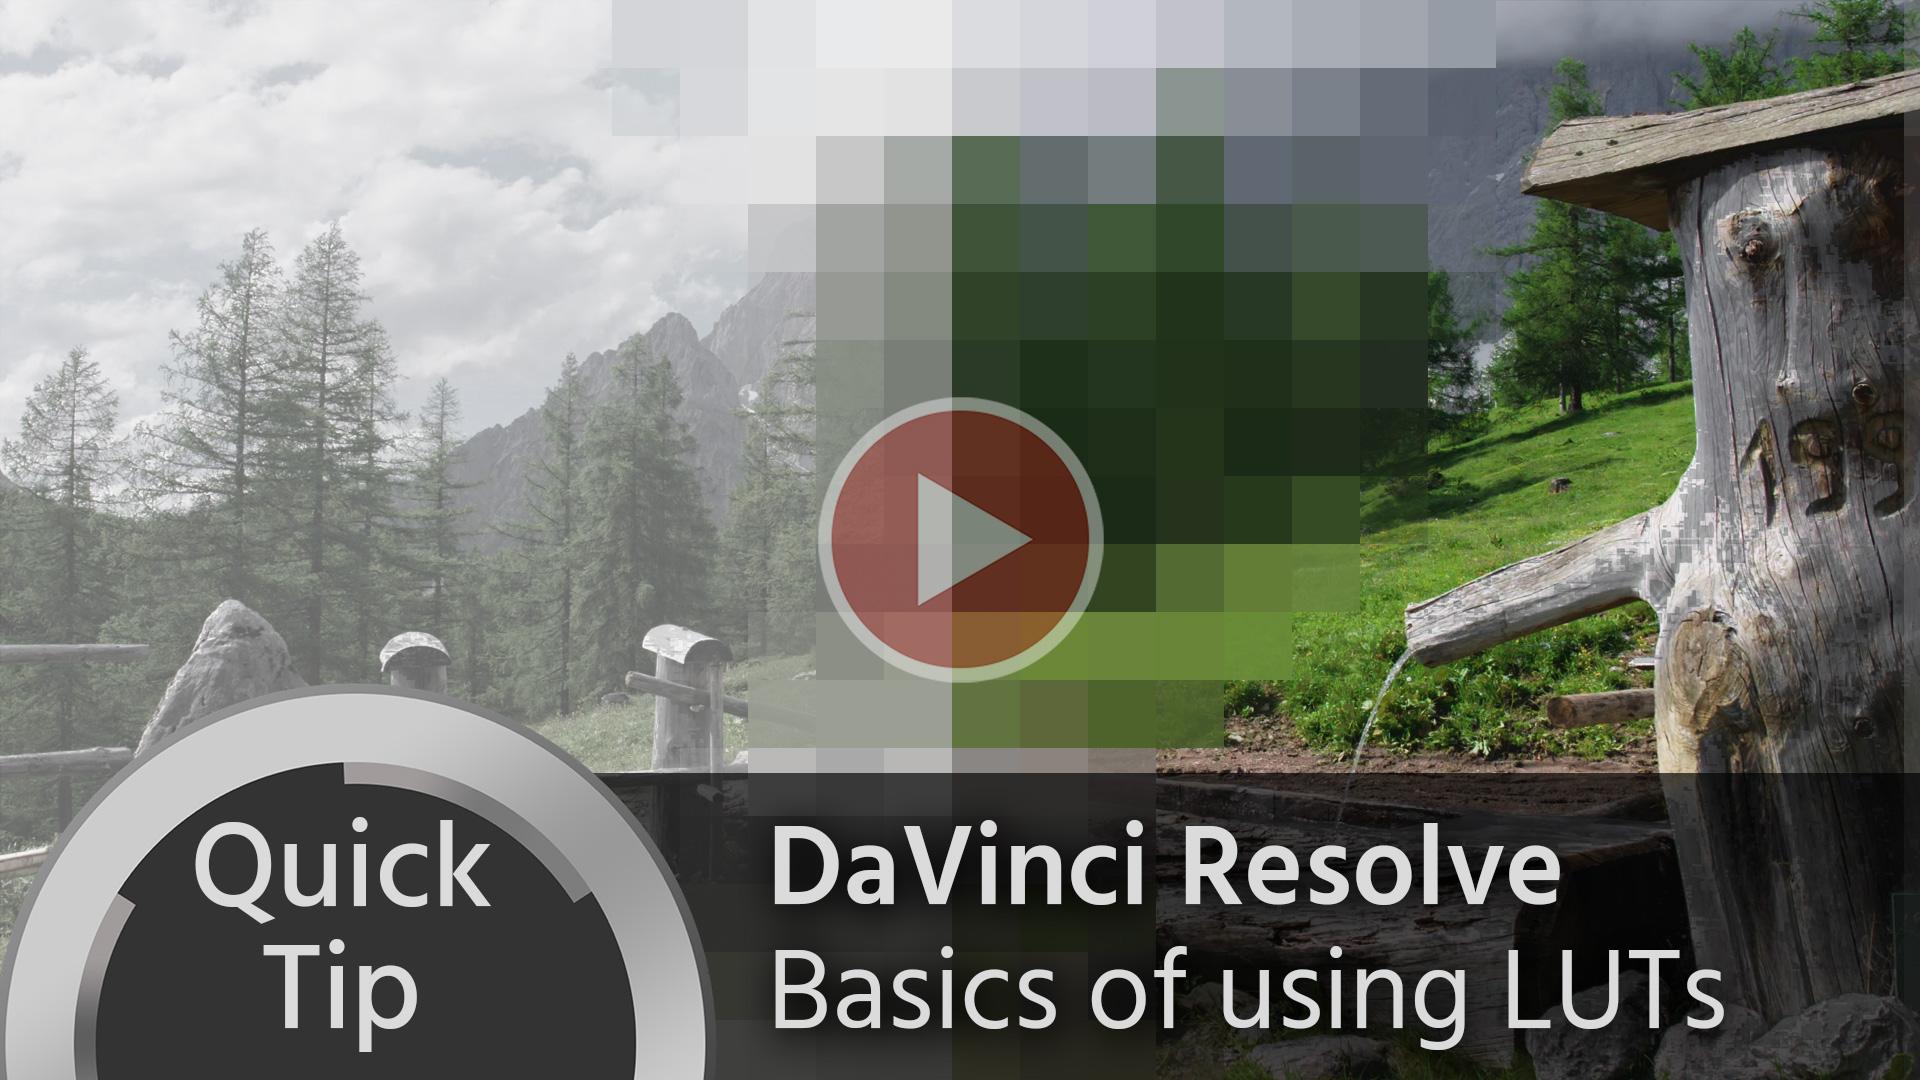 Quick Tip: DaVinci ResolveでLUTを使う